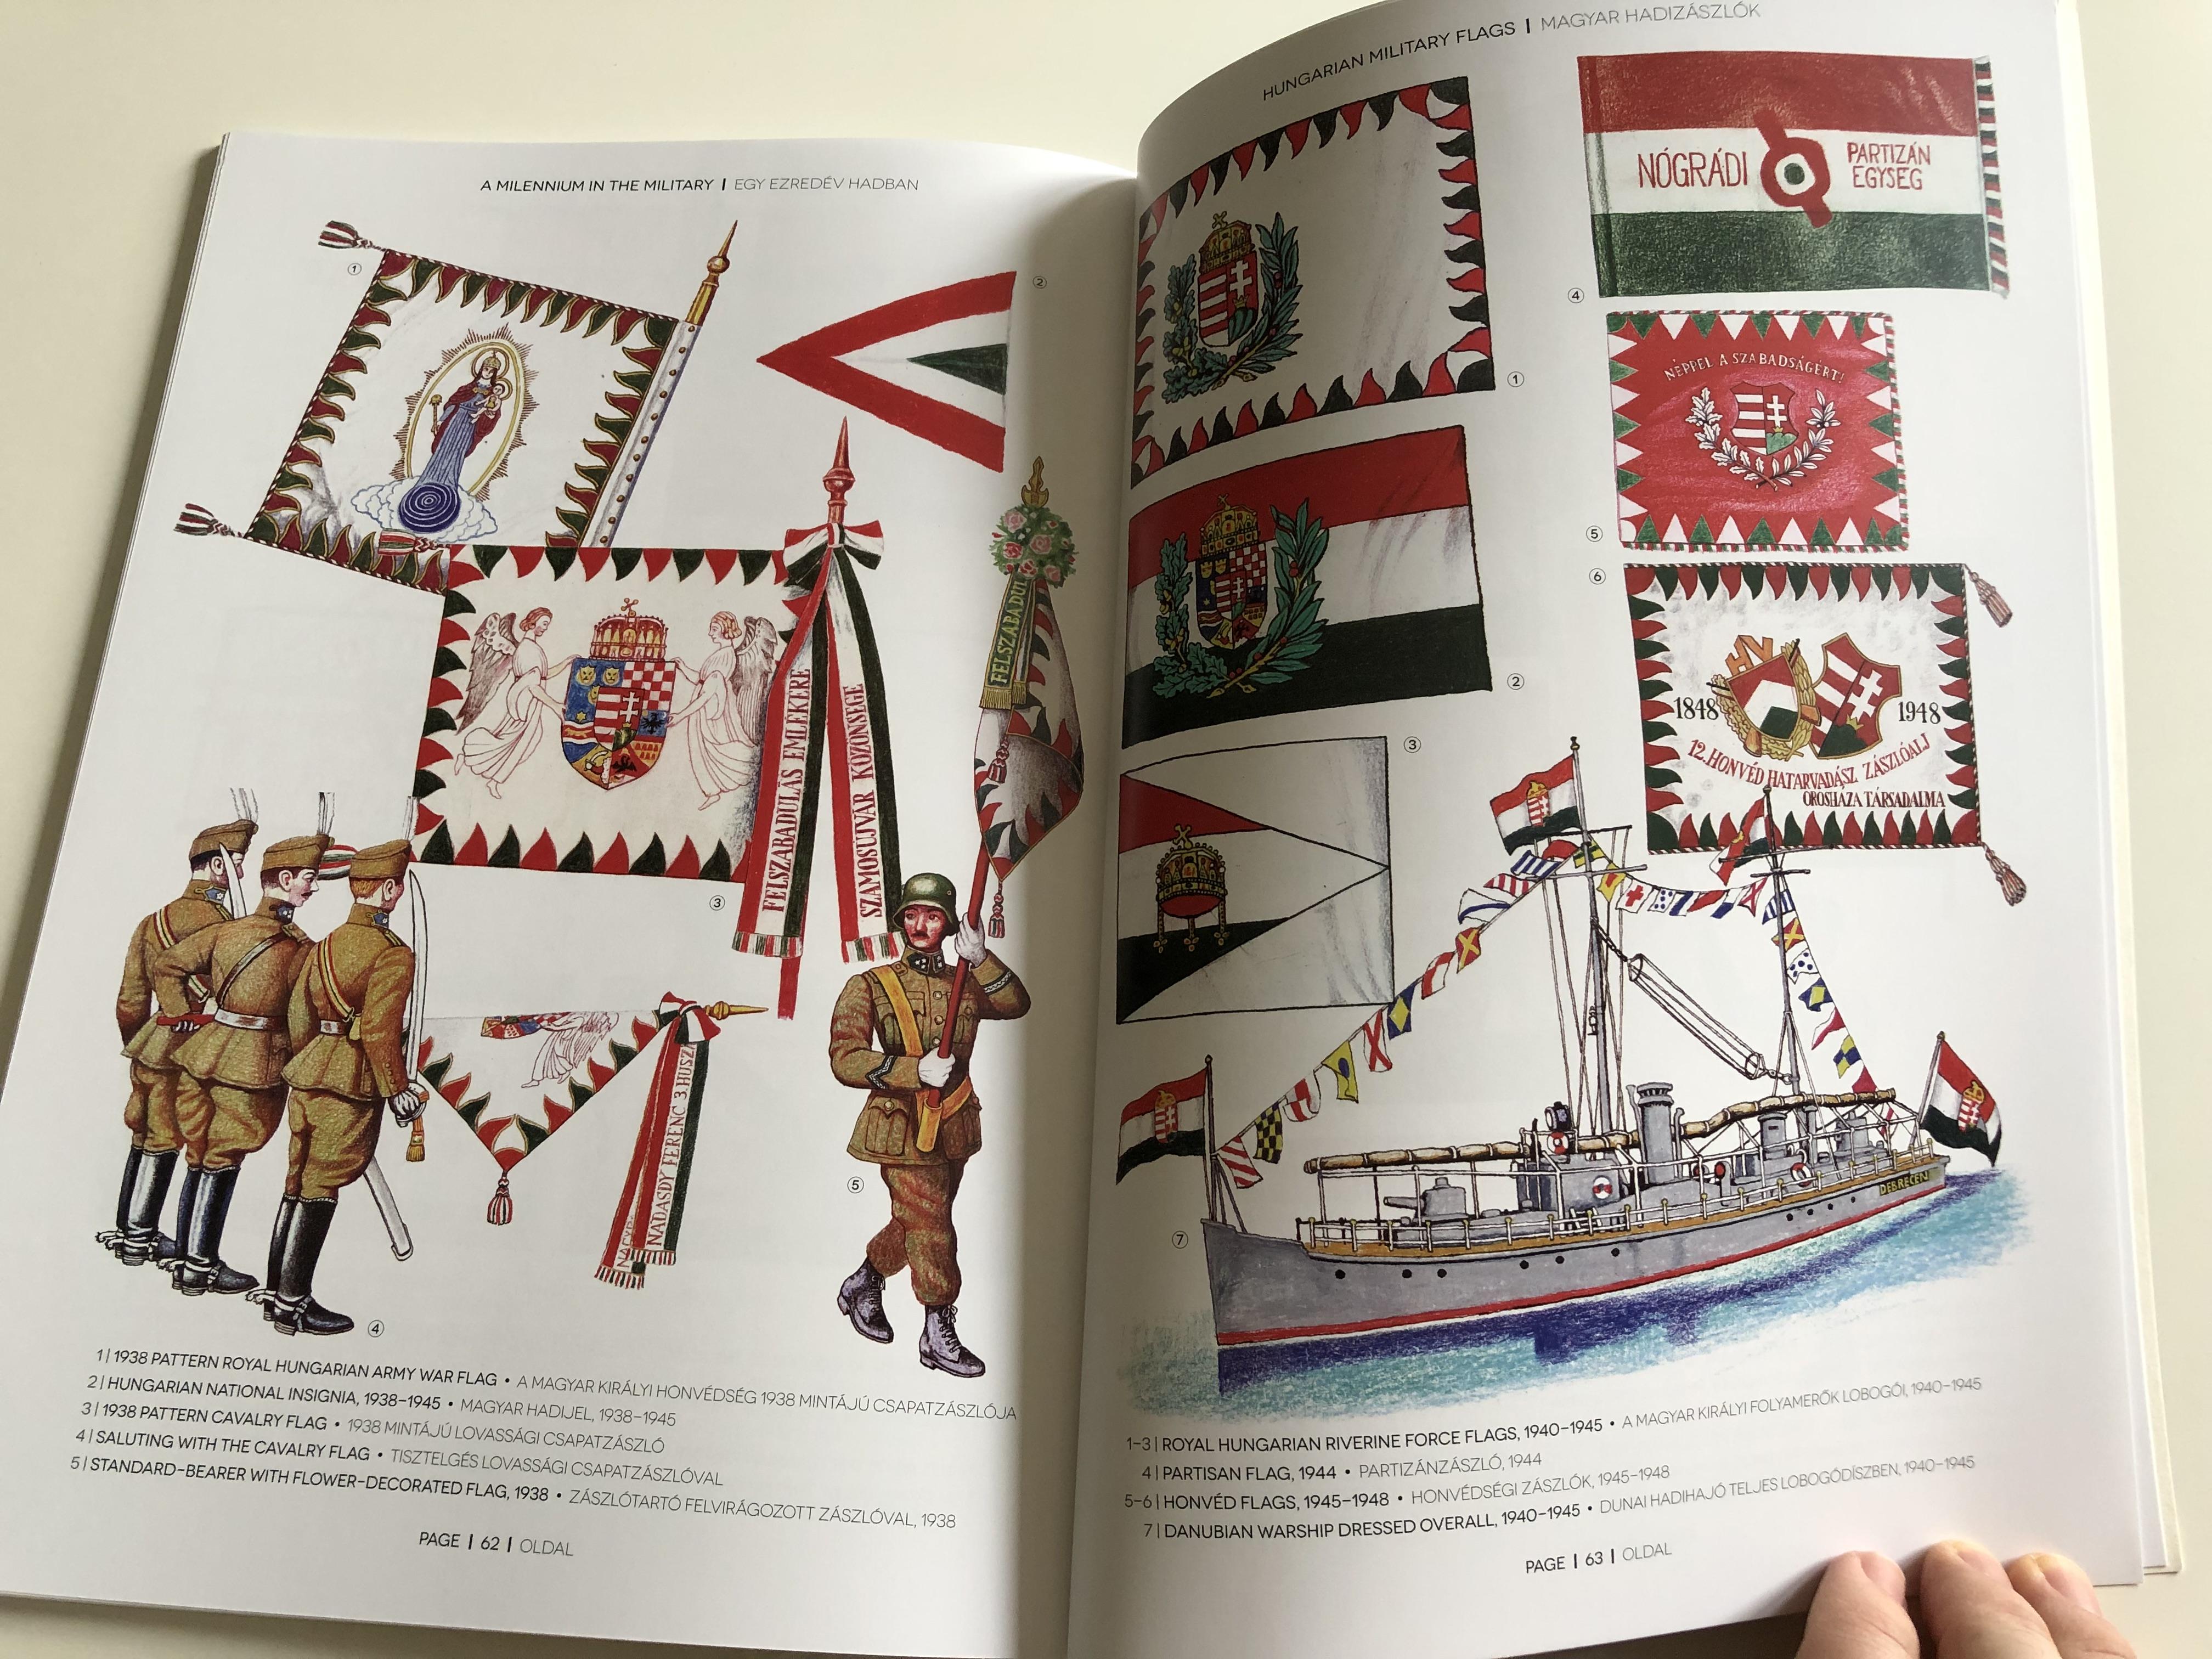 hungarian-military-flags-by-gy-z-somogyi-magyar-hadiz-szl-k-a-millennium-in-the-military-egy-ezred-v-hadban-paperback-2014-hm-zr-nyi-11-.jpg